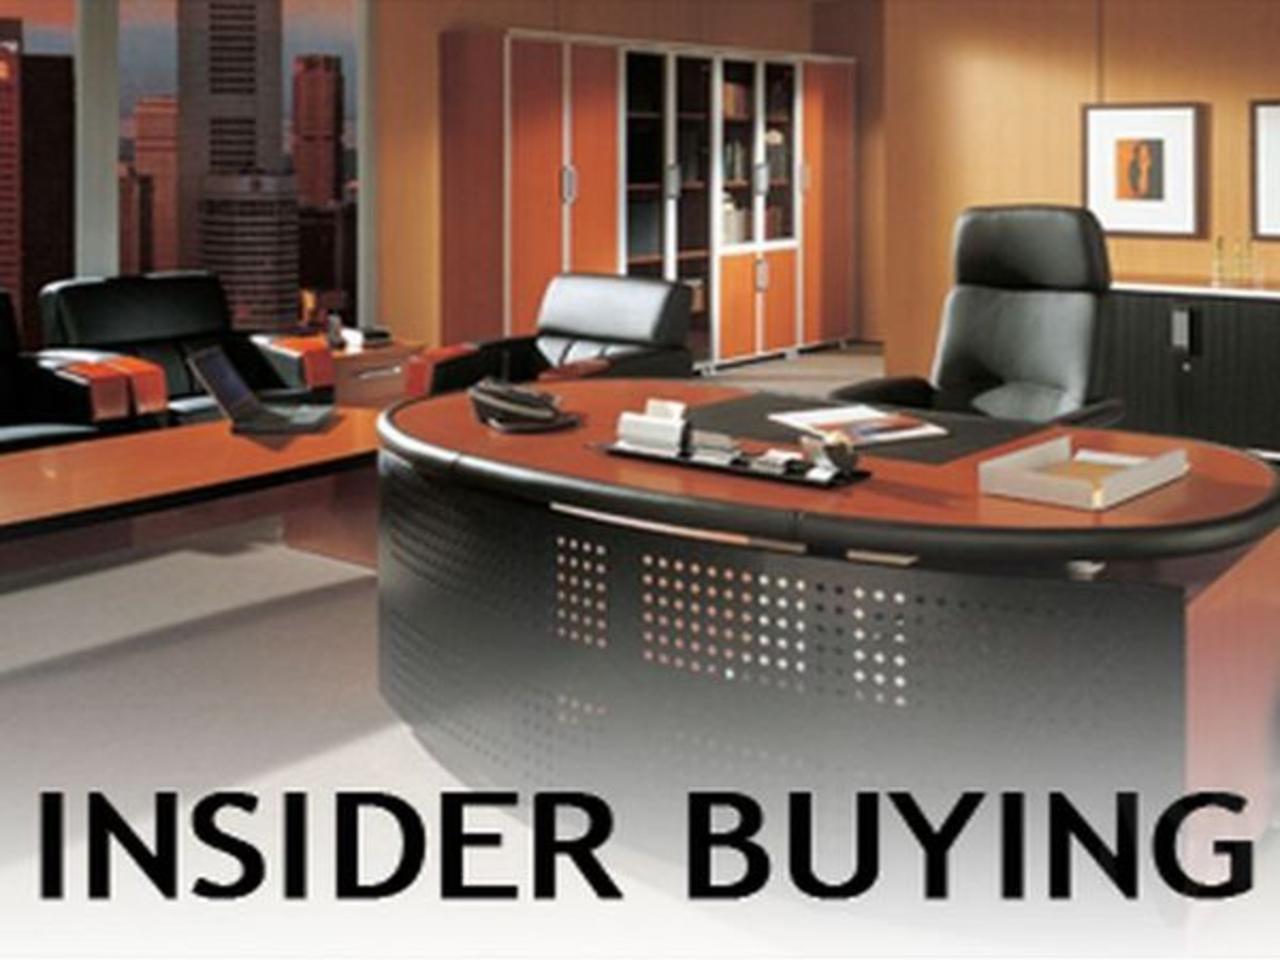 Monday 5/10 Insider Buying Report: RILY, RYAM